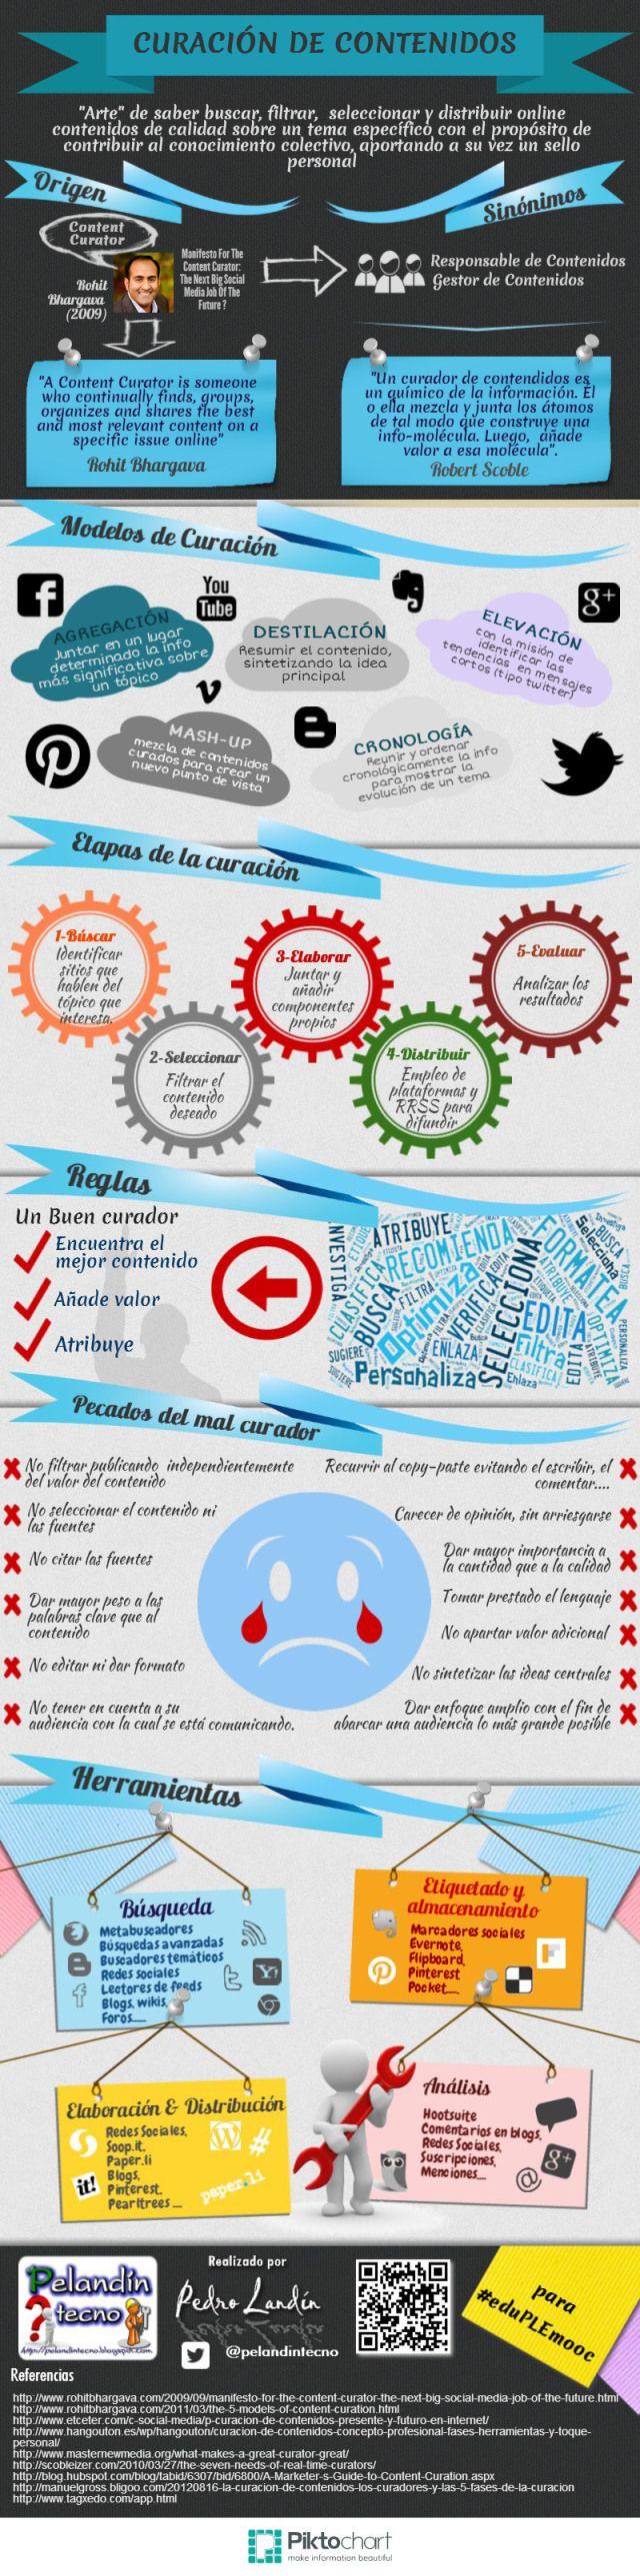 la curación de contenidos #infografia #infographic #marketing